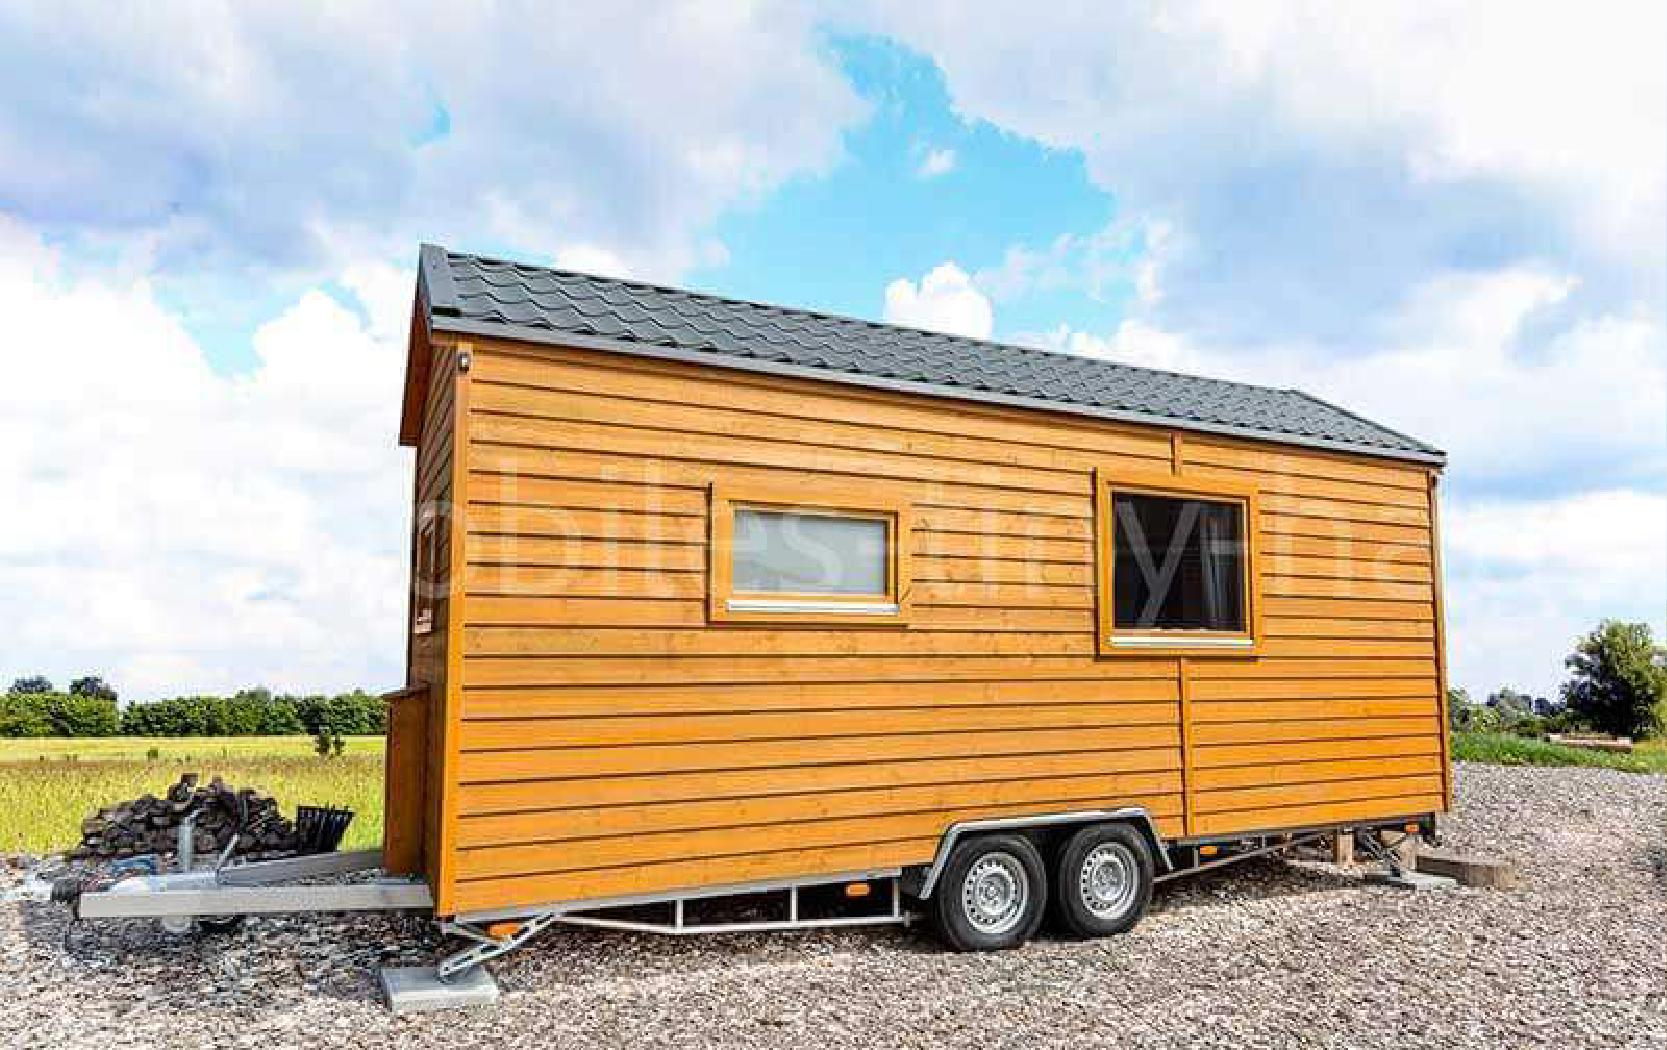 mobiles-chalet-schweiz-mobiles-tiny-house